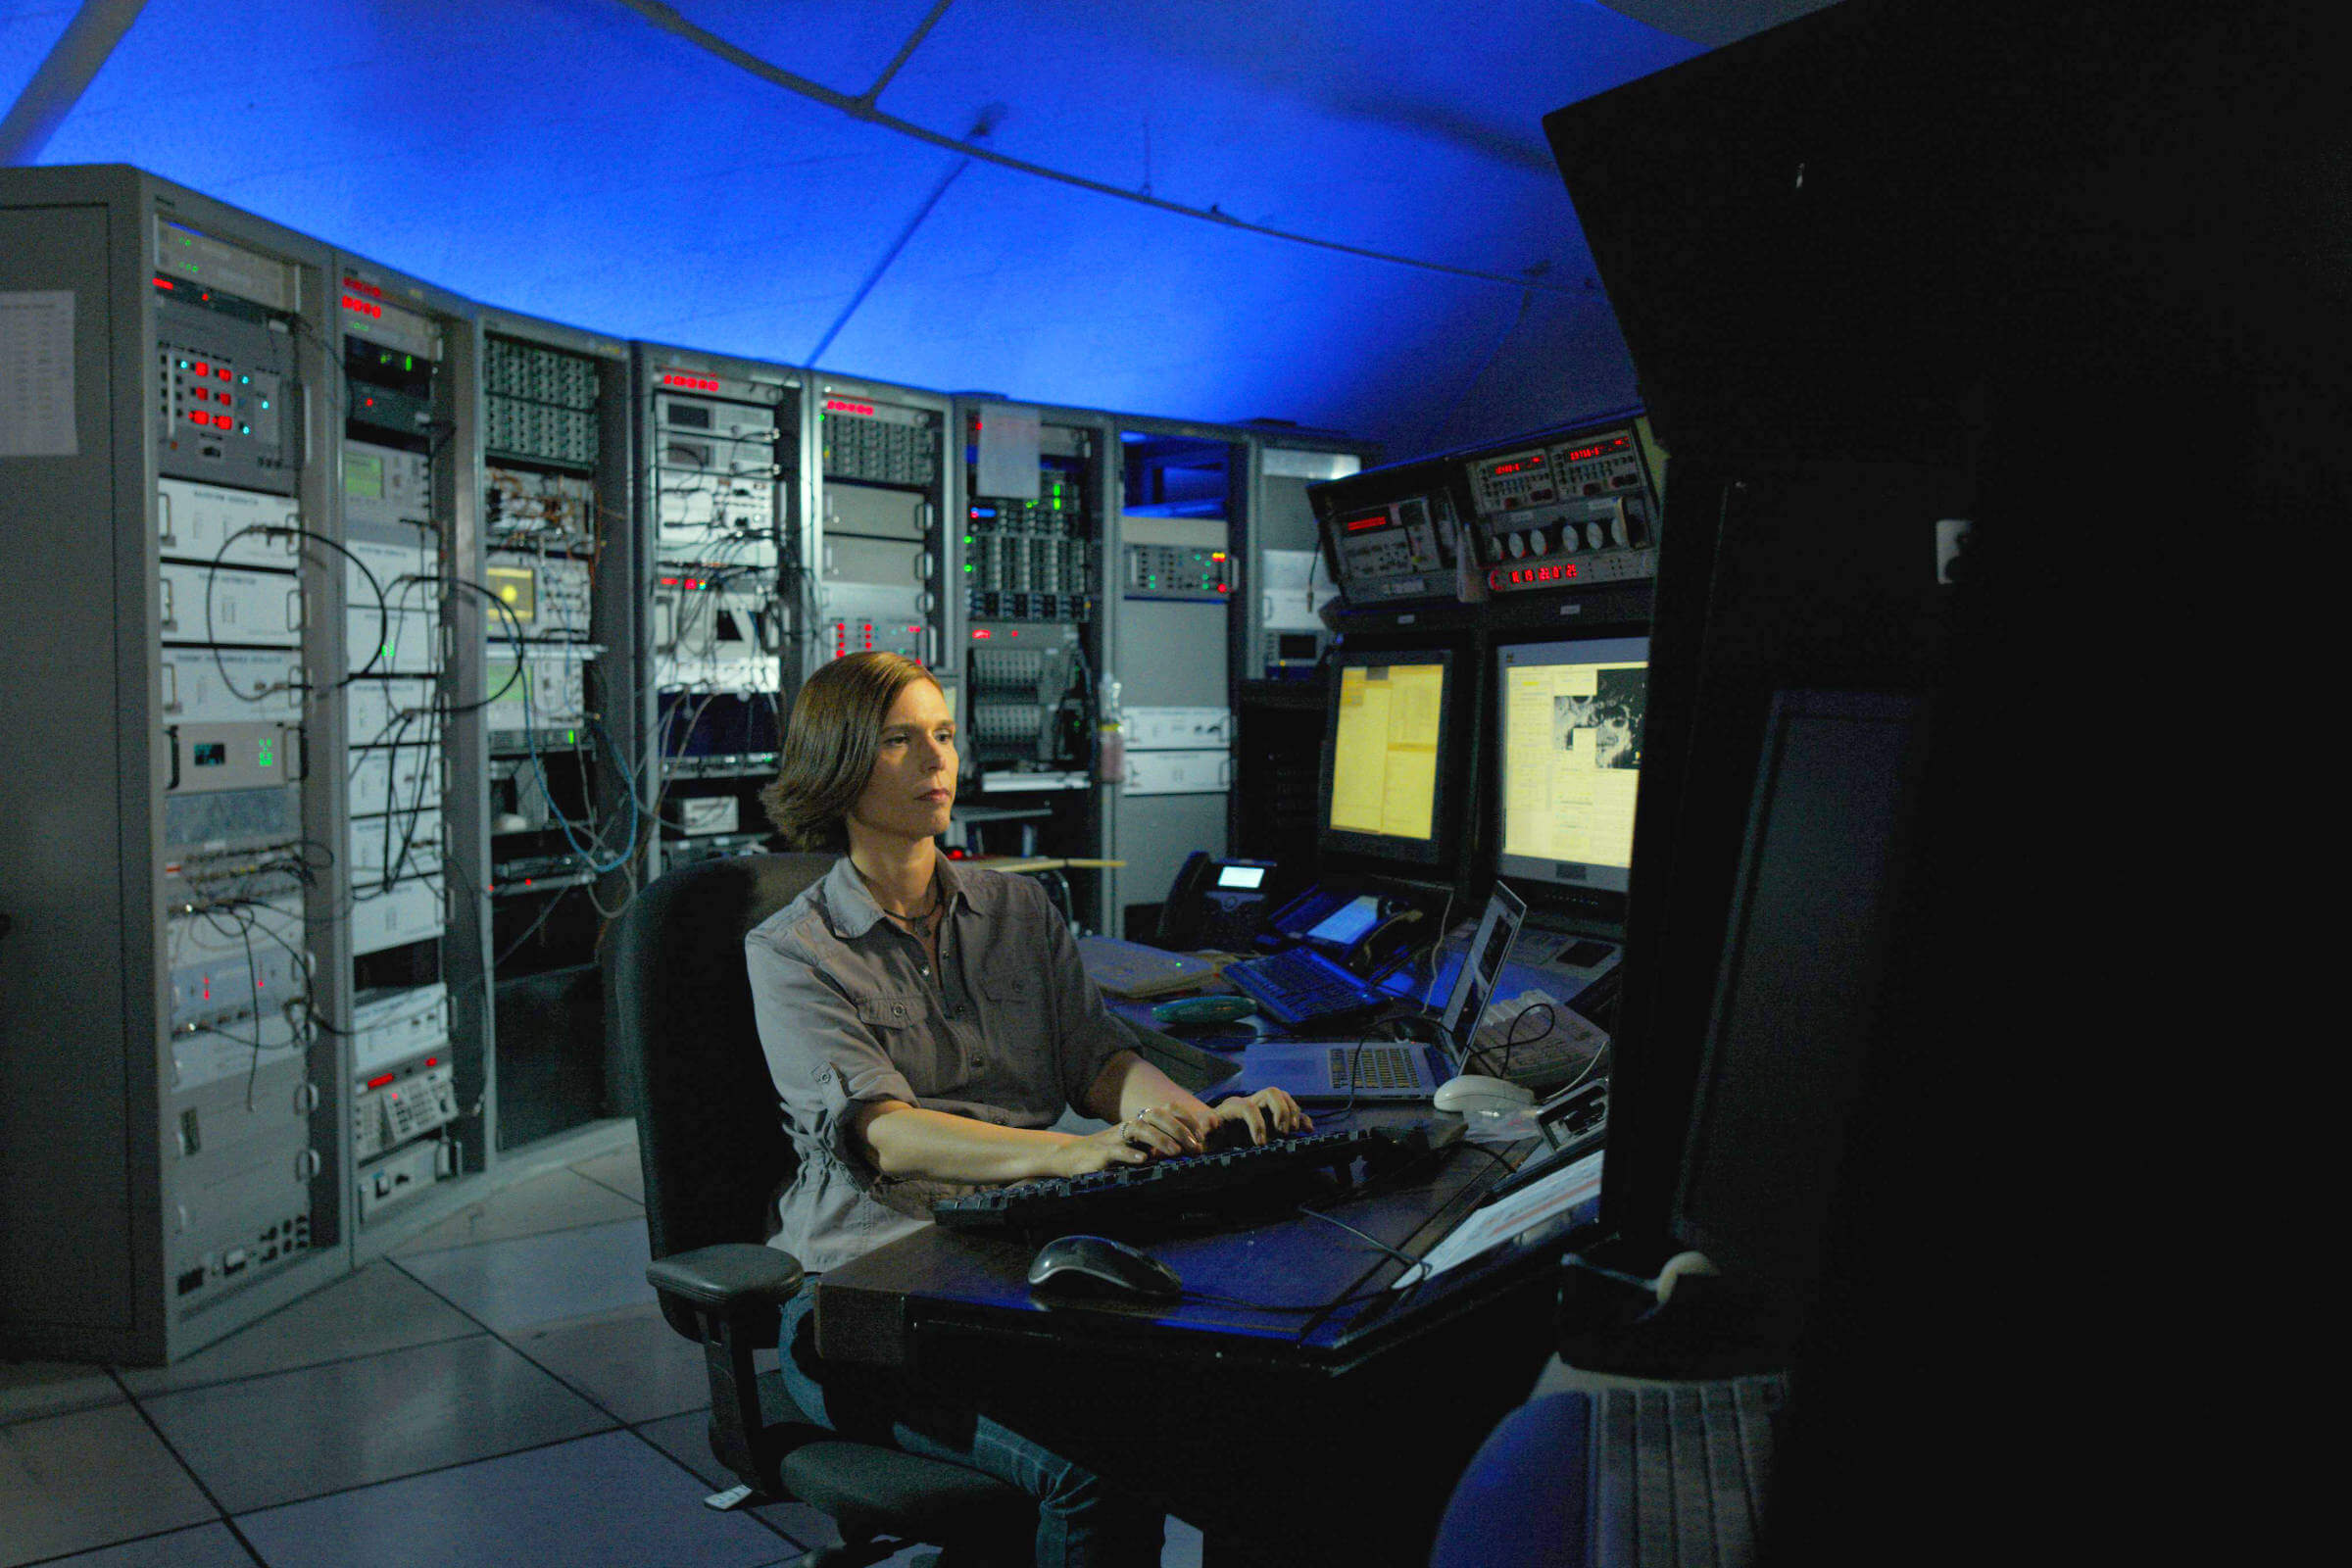 Marina Brozović PhD of NASA's Jet Propulsion Laboratory studies radar signals to understand the size, speed and location of asteroids.